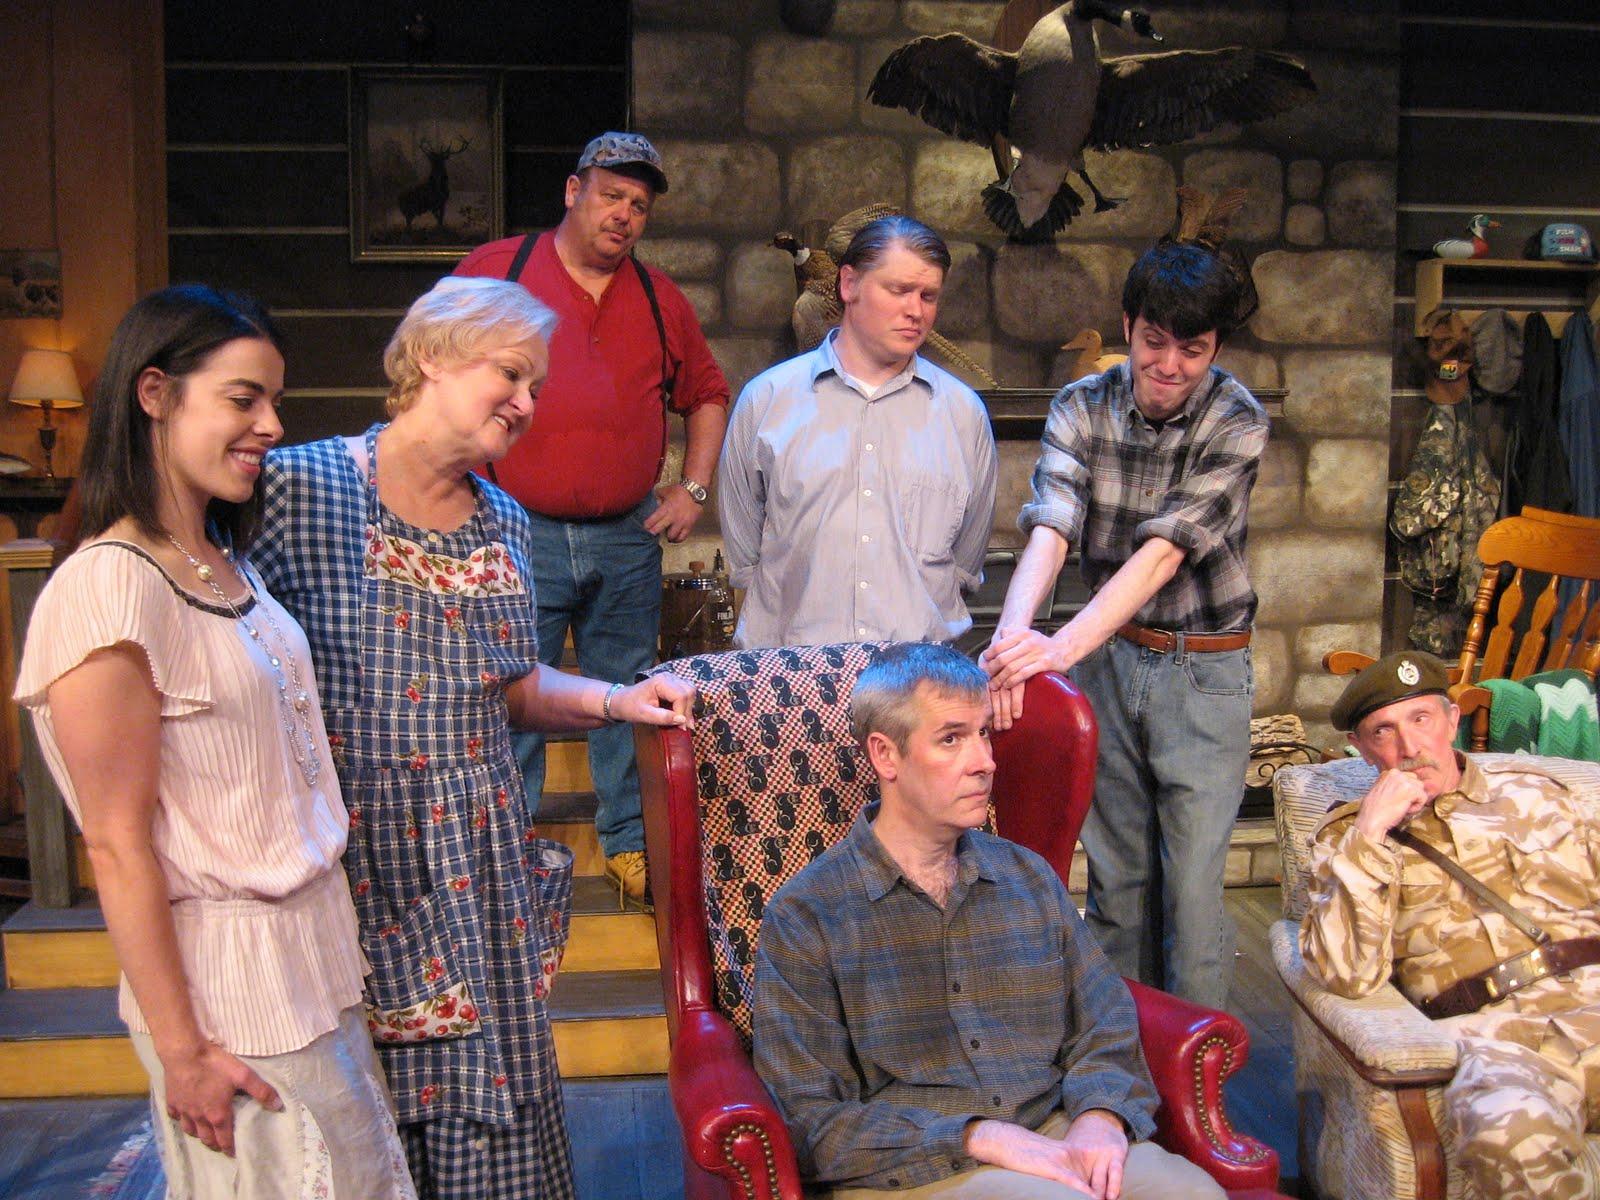 Wonderful Intimate Theatre - Review of Bunbury Theatre ...